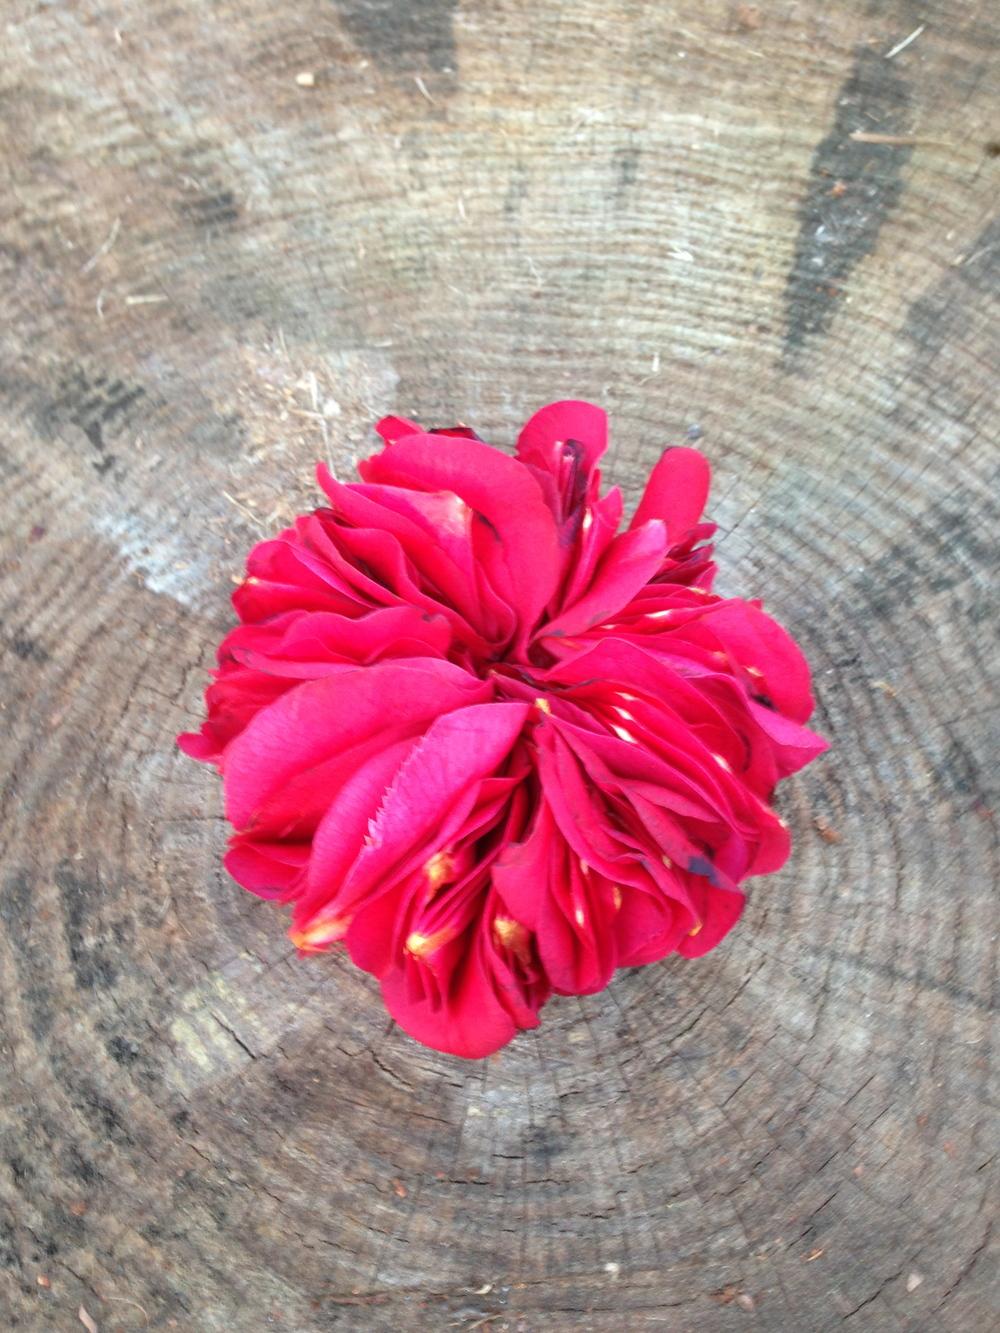 Camellia petals on stump. Athens, GA. Spring 2013.